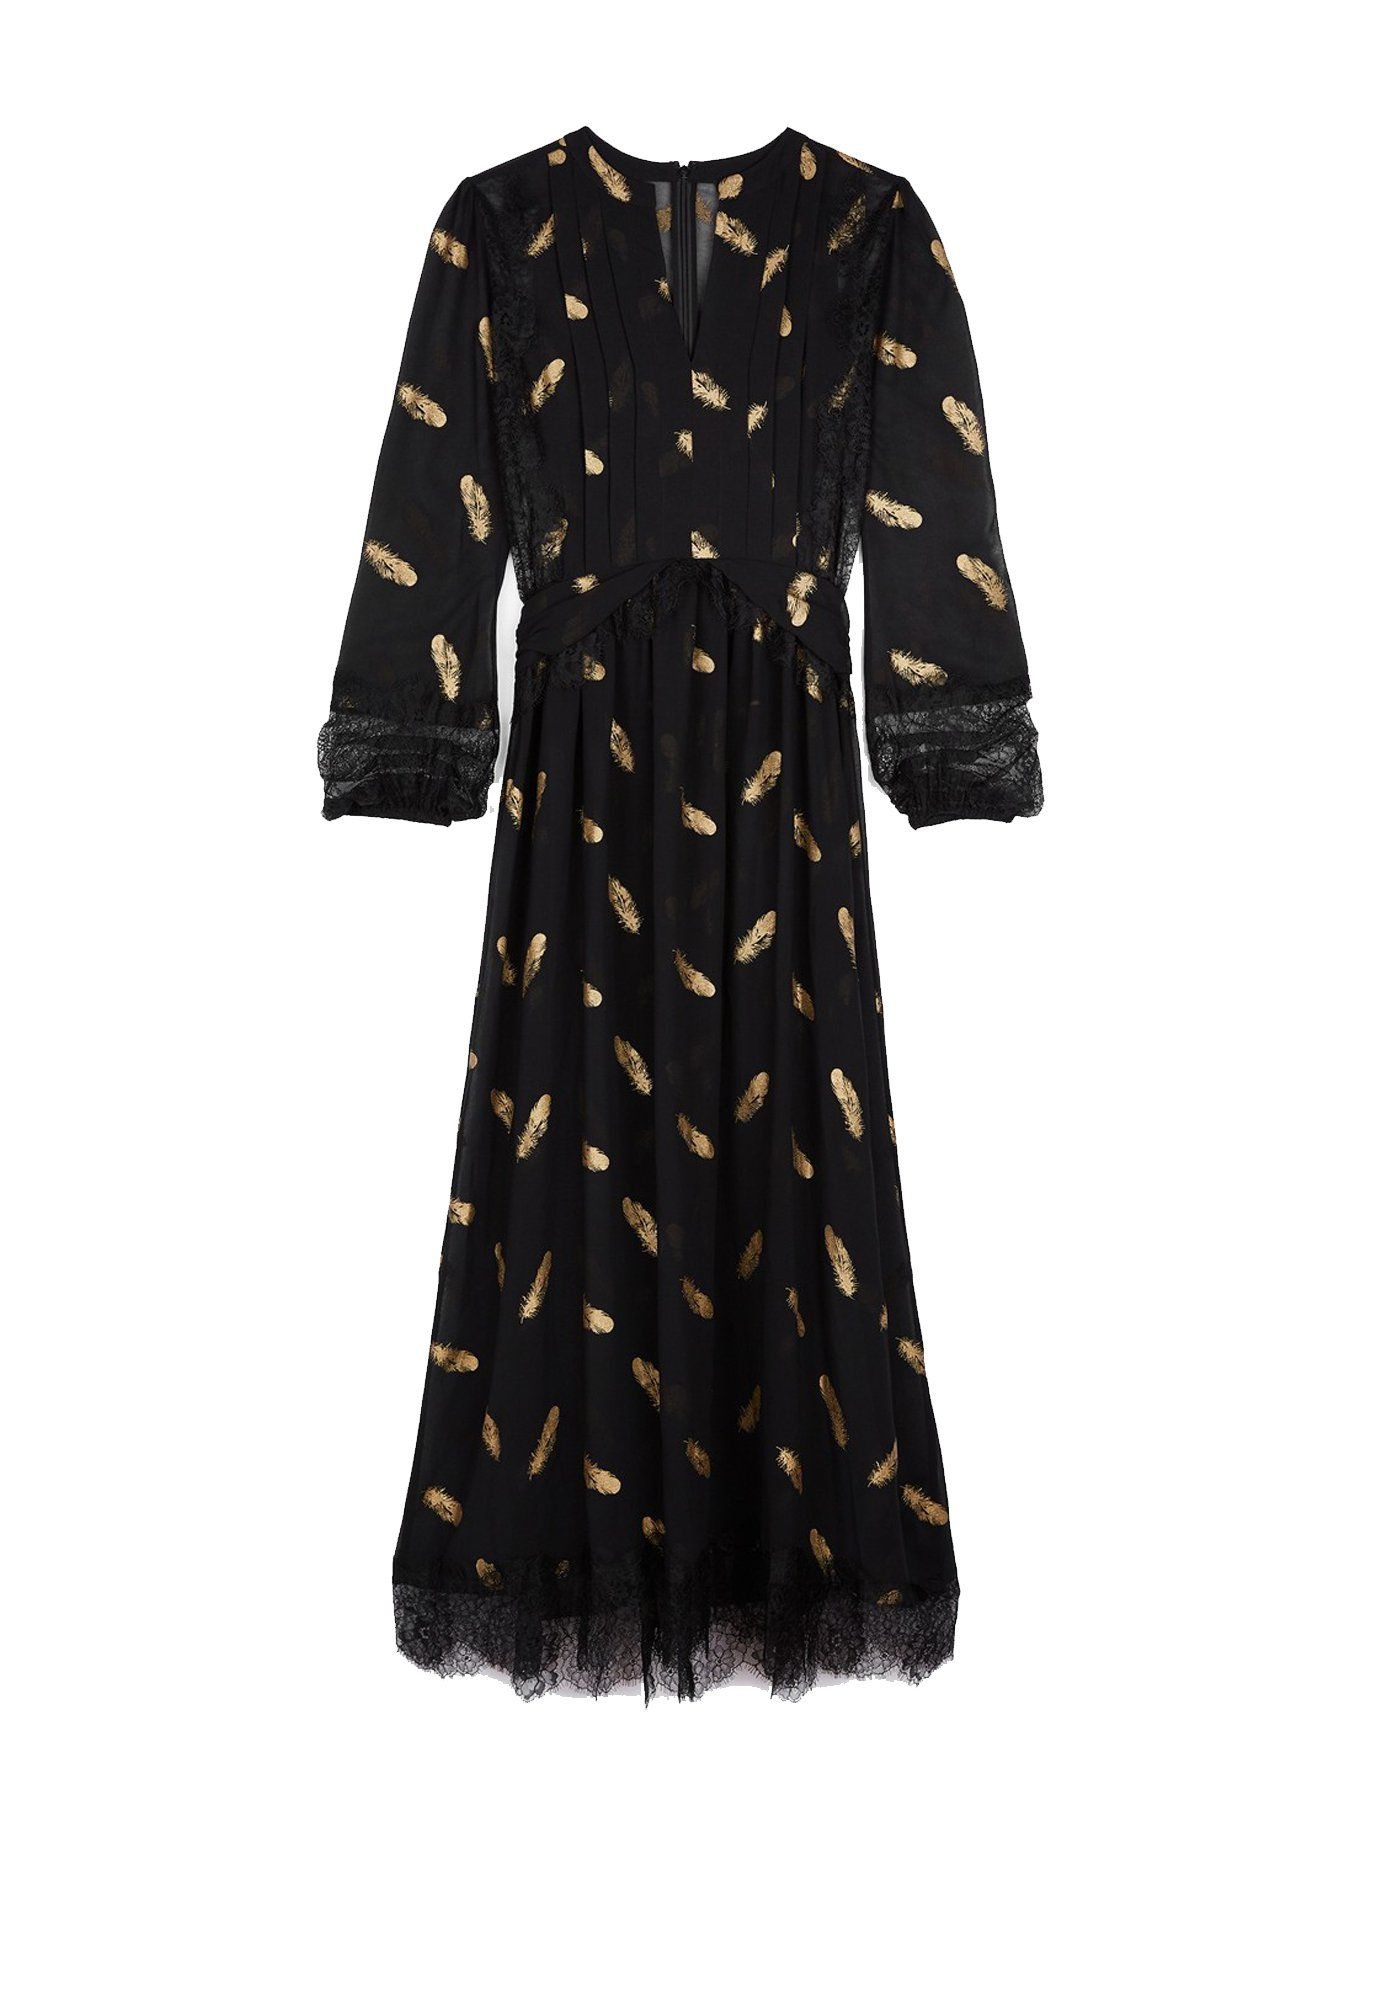 Wet look robe juste en automne//hiver arrivées